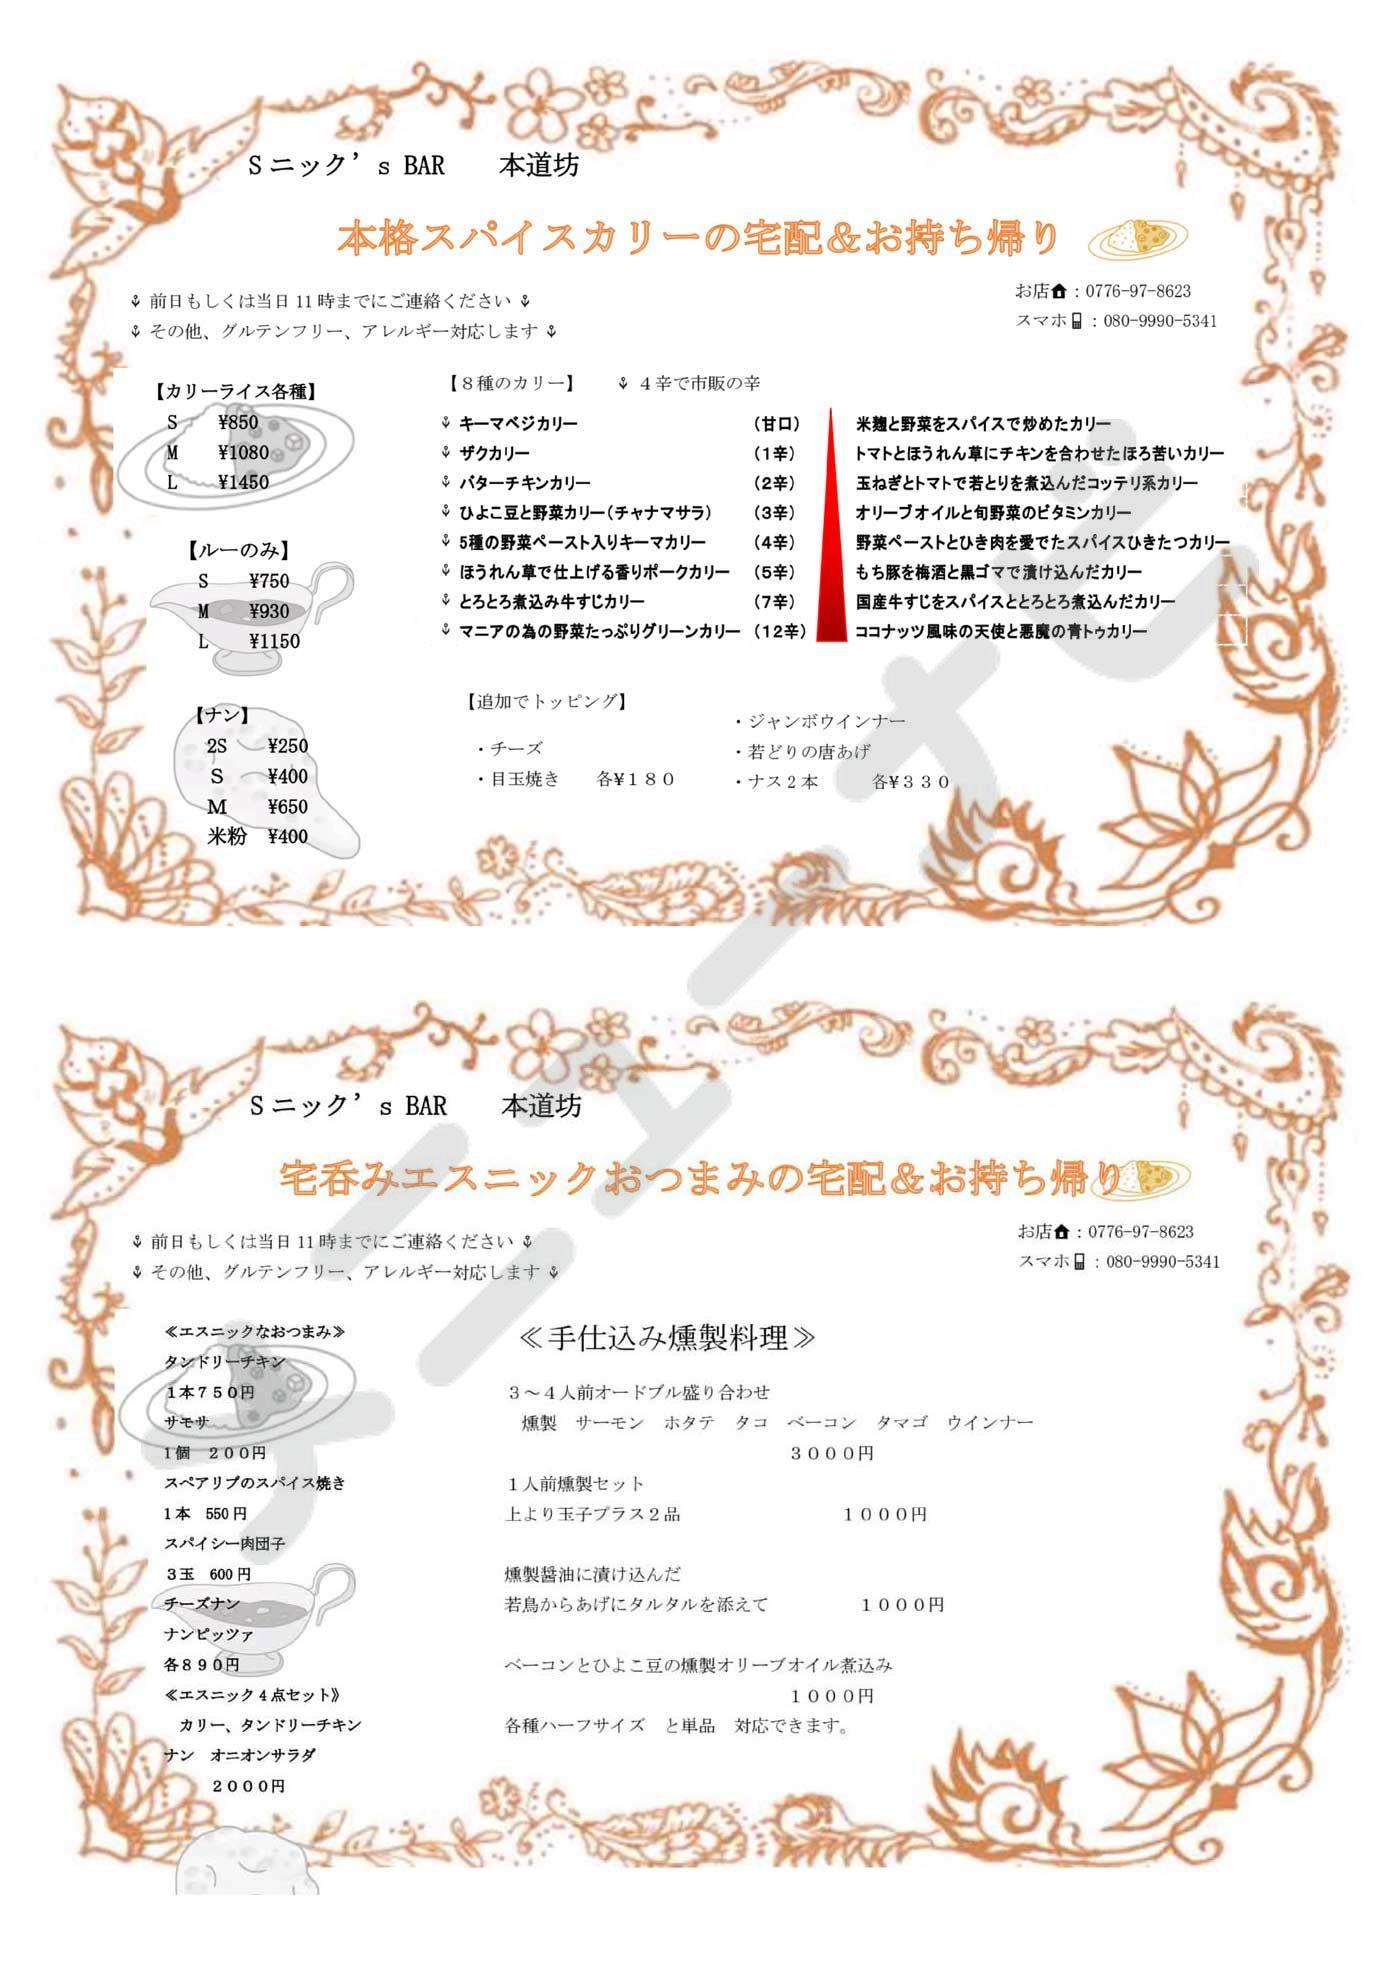 Sニック'S BAR 本道坊(テイクアウト)